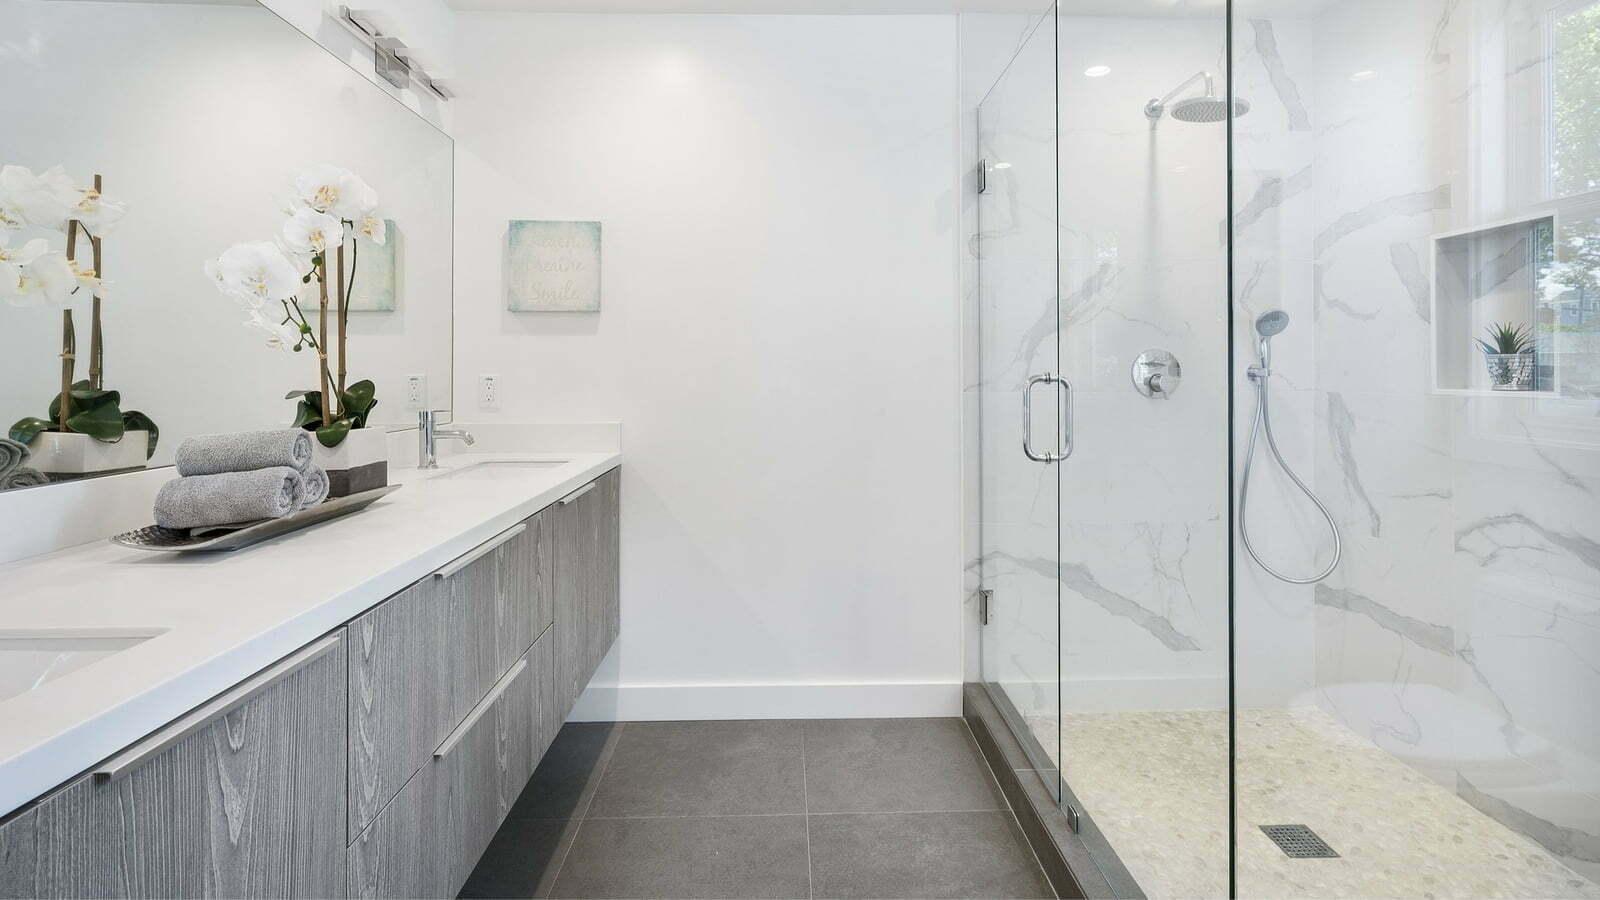 foley remodeling bathroom design ideas